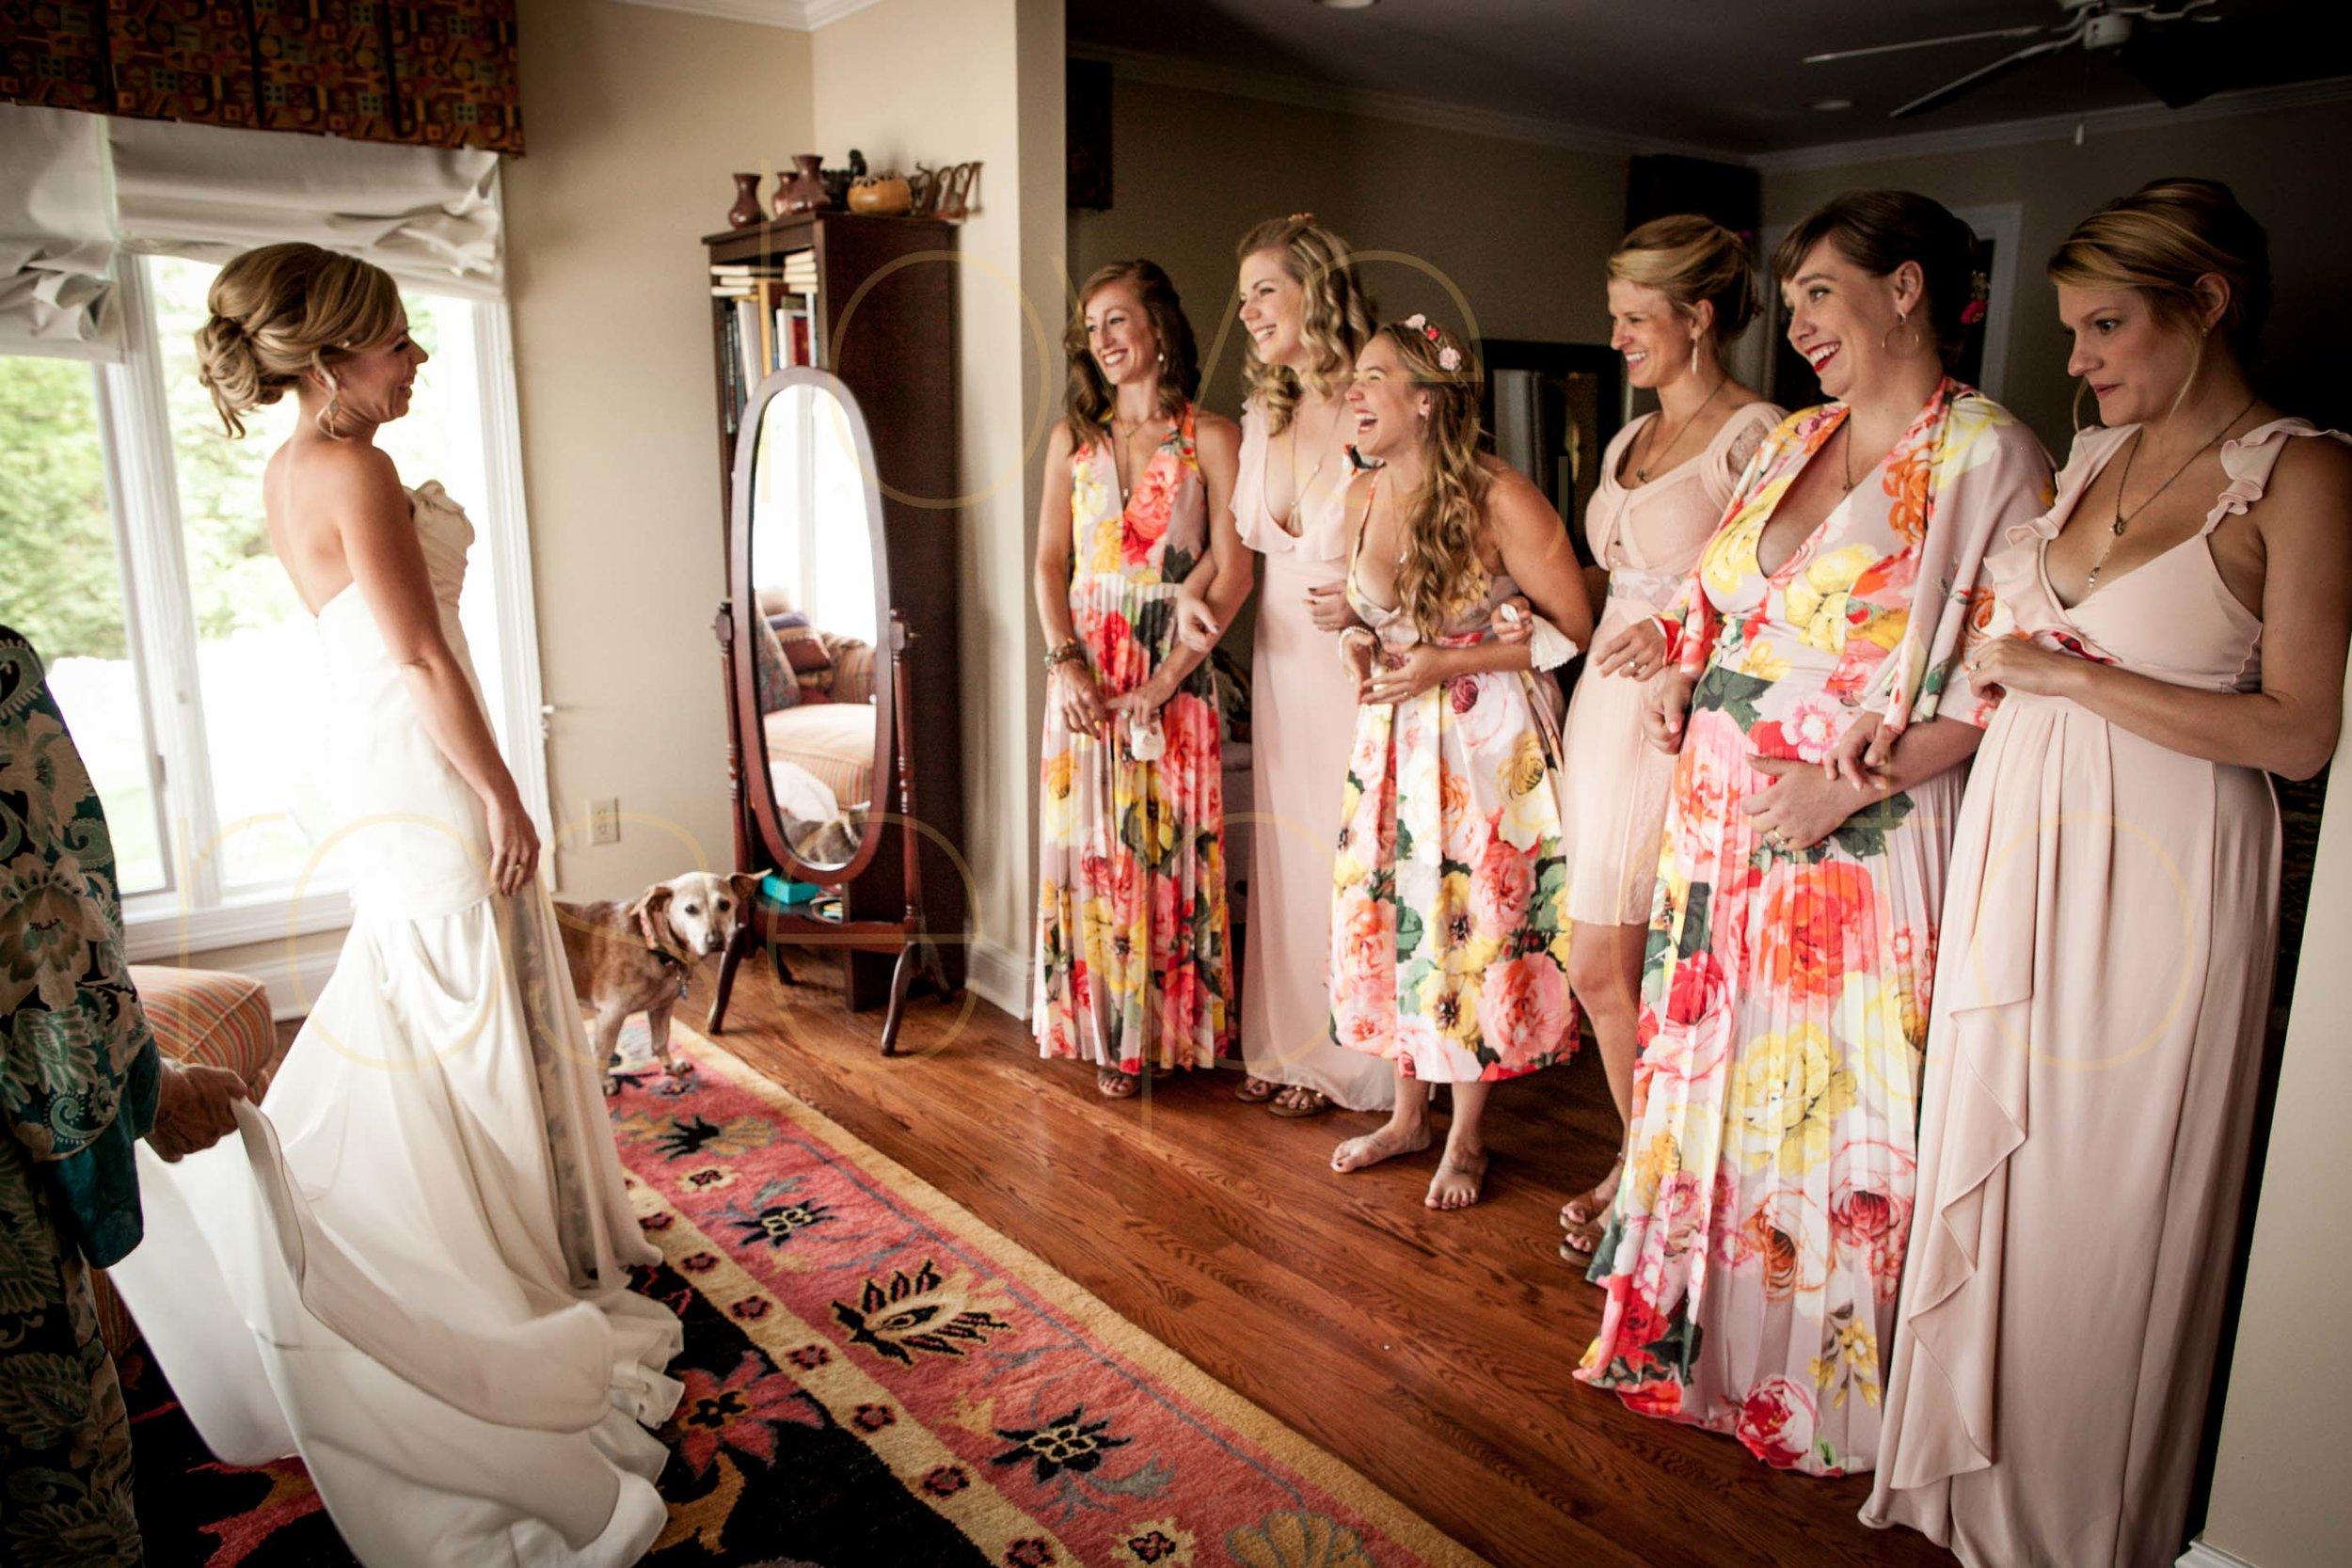 Rose Photo Asheville Wedding Photographer Nasheville Weddings Charleston Bride Chicago photojournalist weddings -17.jpg